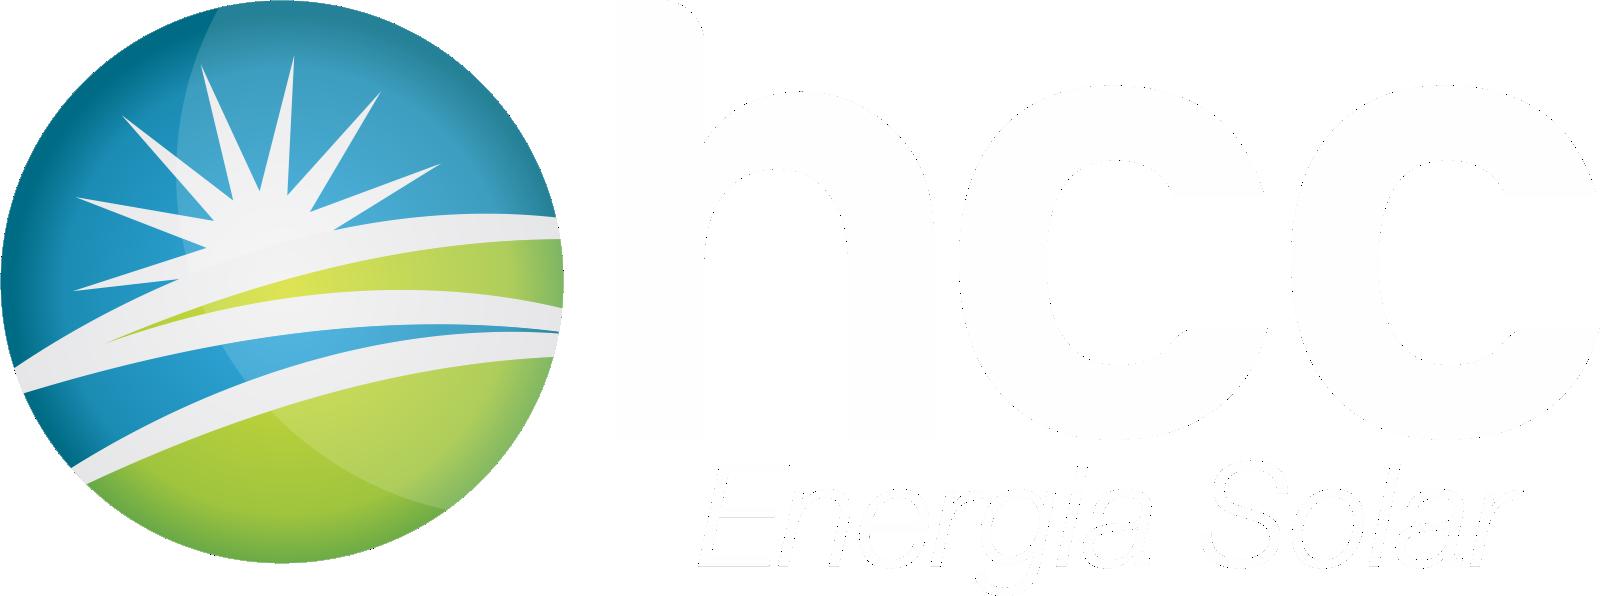 logo hcc energia solar ebook gratuito para empreendedores iniciantes